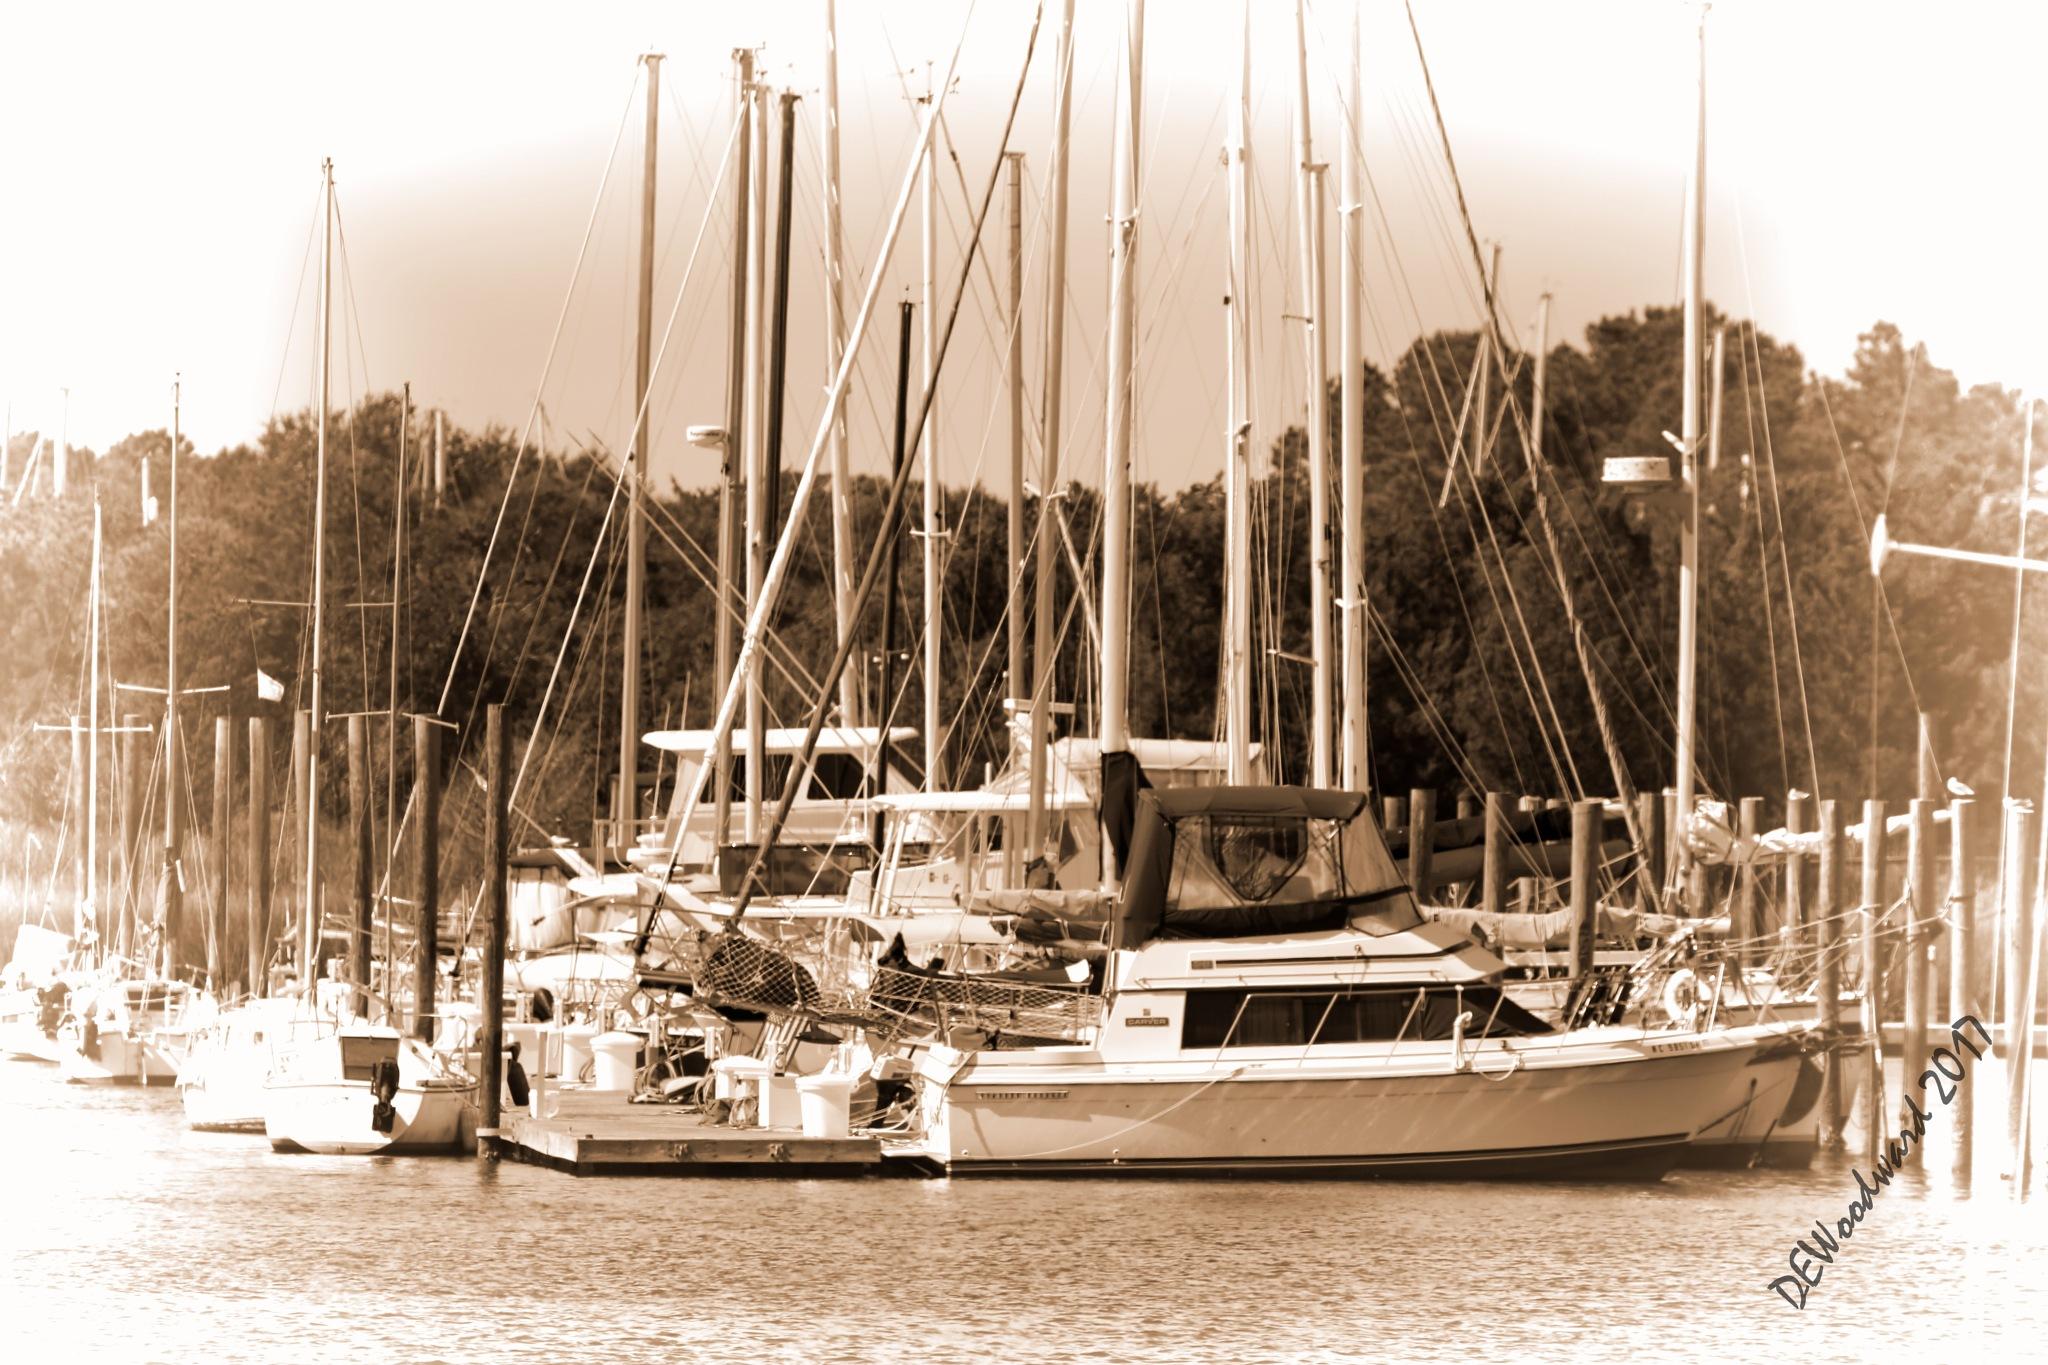 Southport N.C. Marina by dewoodward